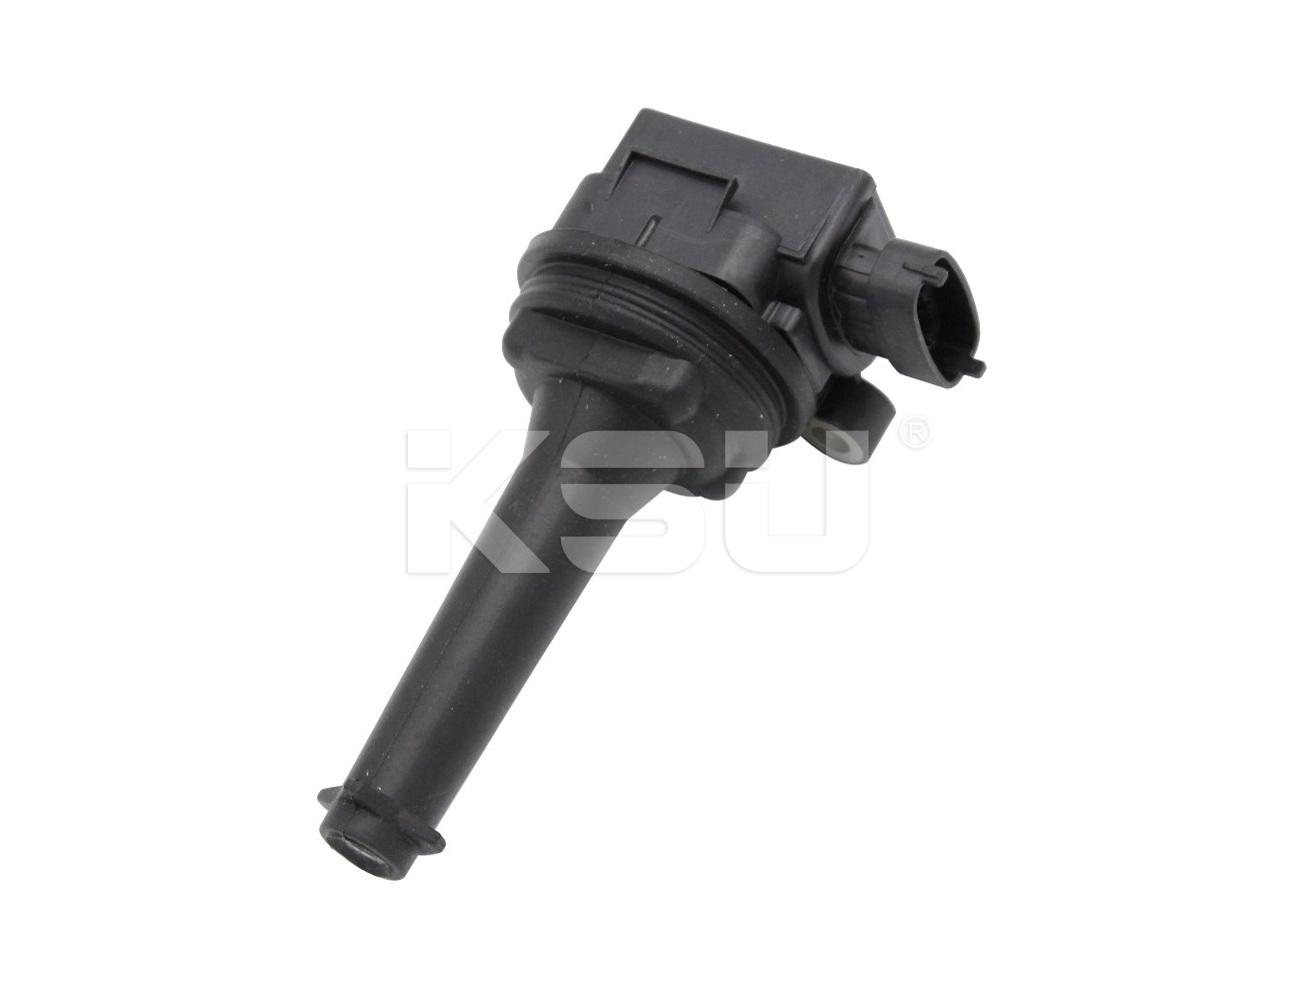 VOLVO-30713416,9125601BOSCH-0221604008 Ignition Coil